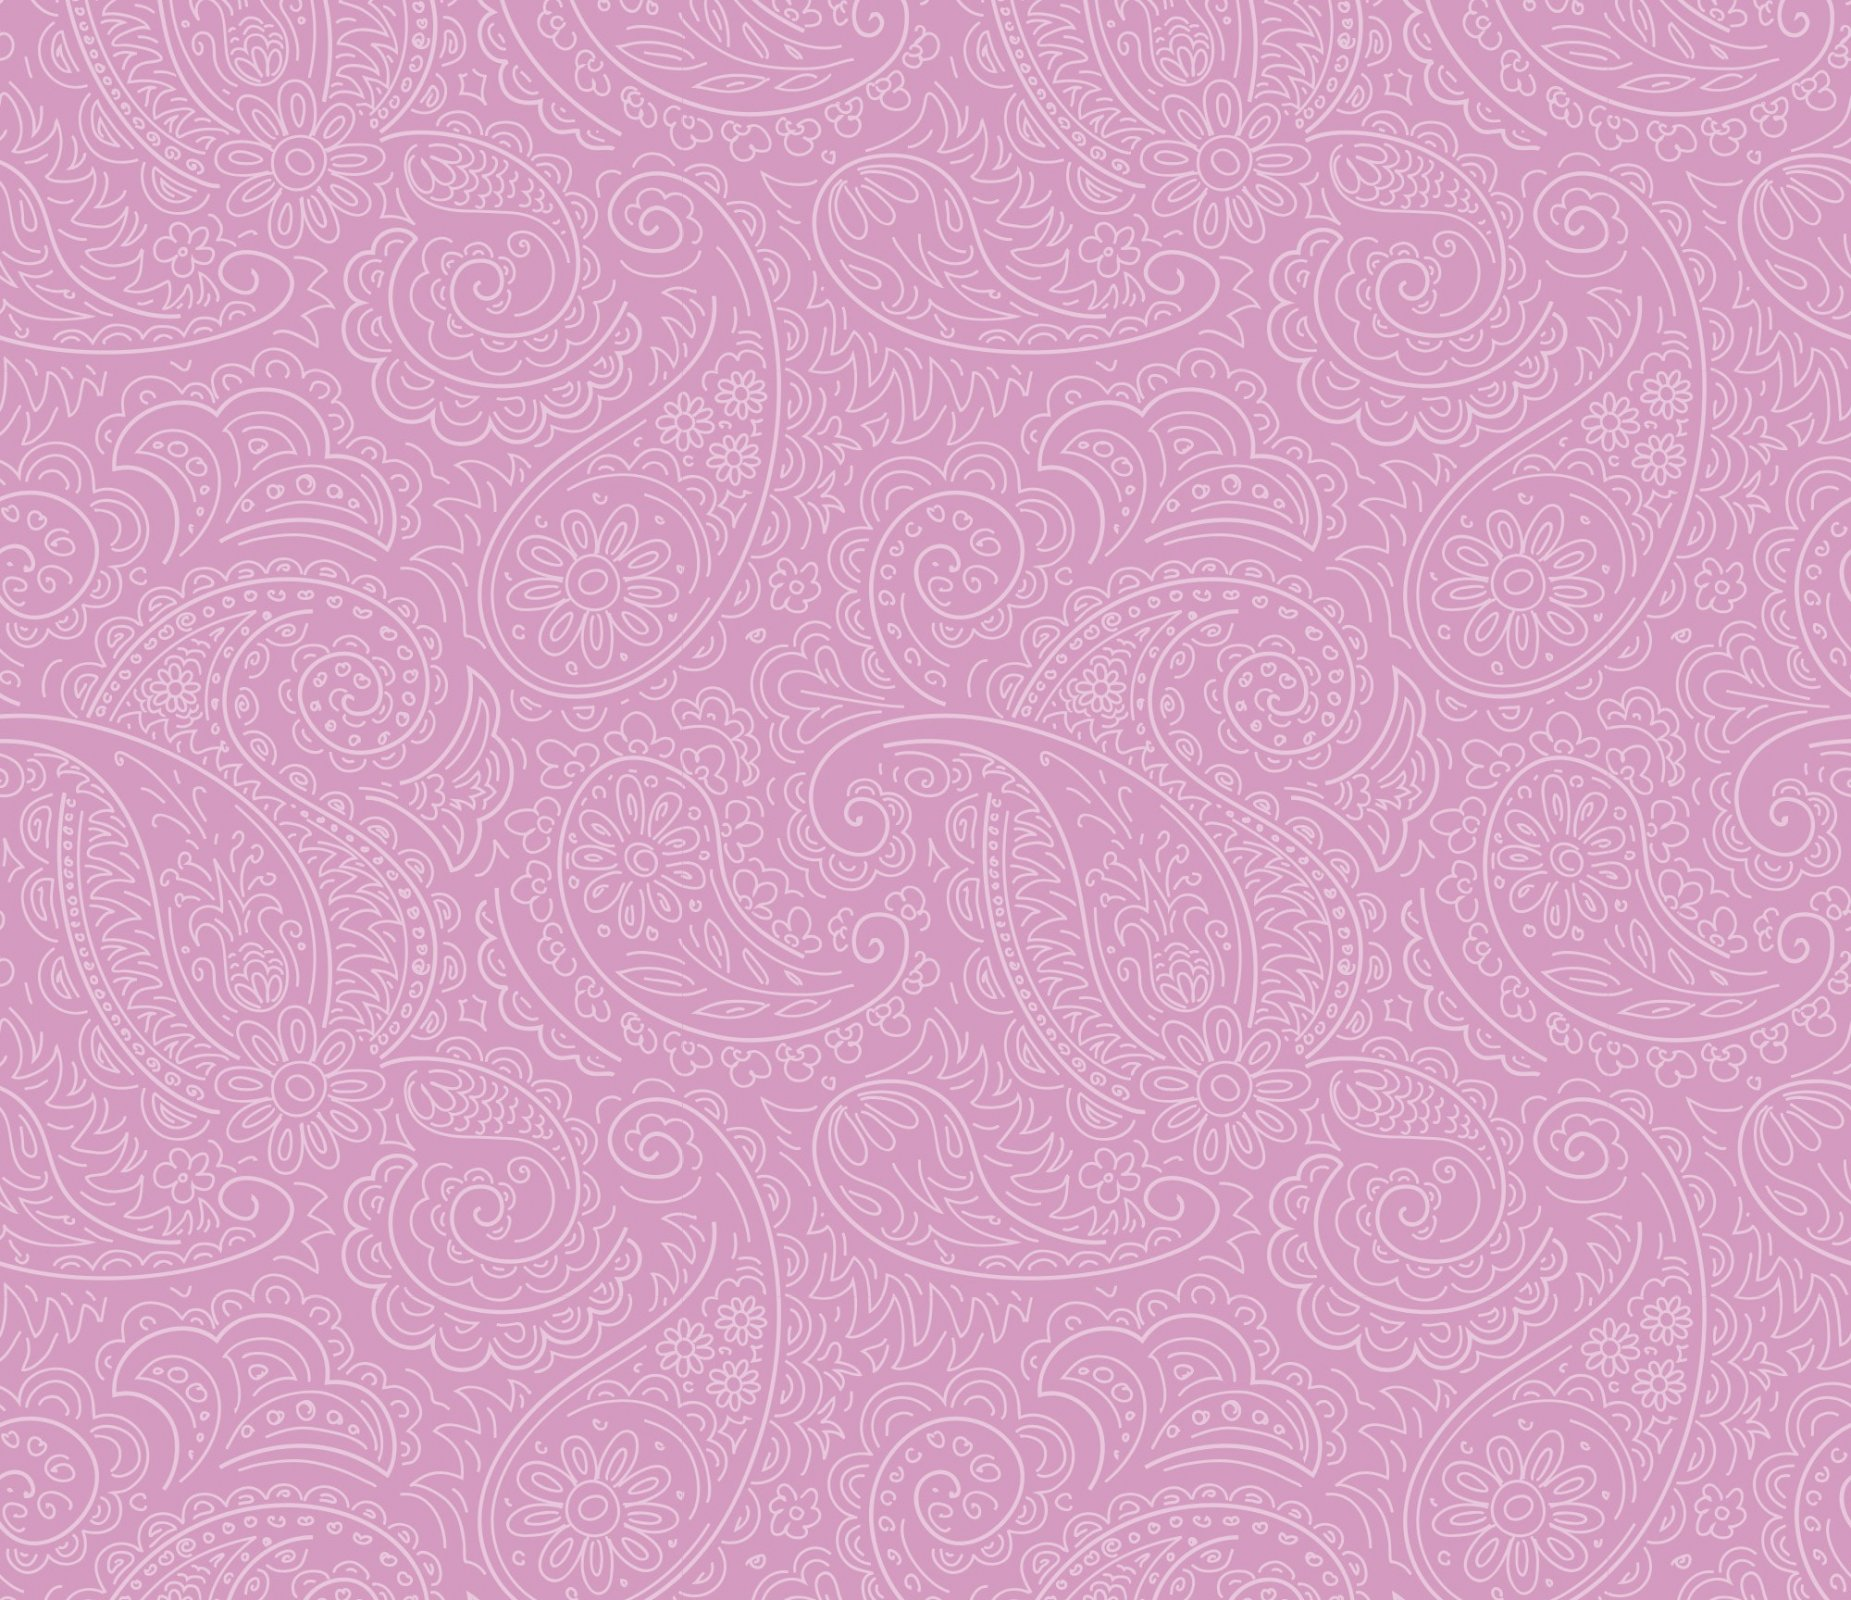 DT-Prima Meadows DX-1784-0C-5 Pink - Drawn Paisley